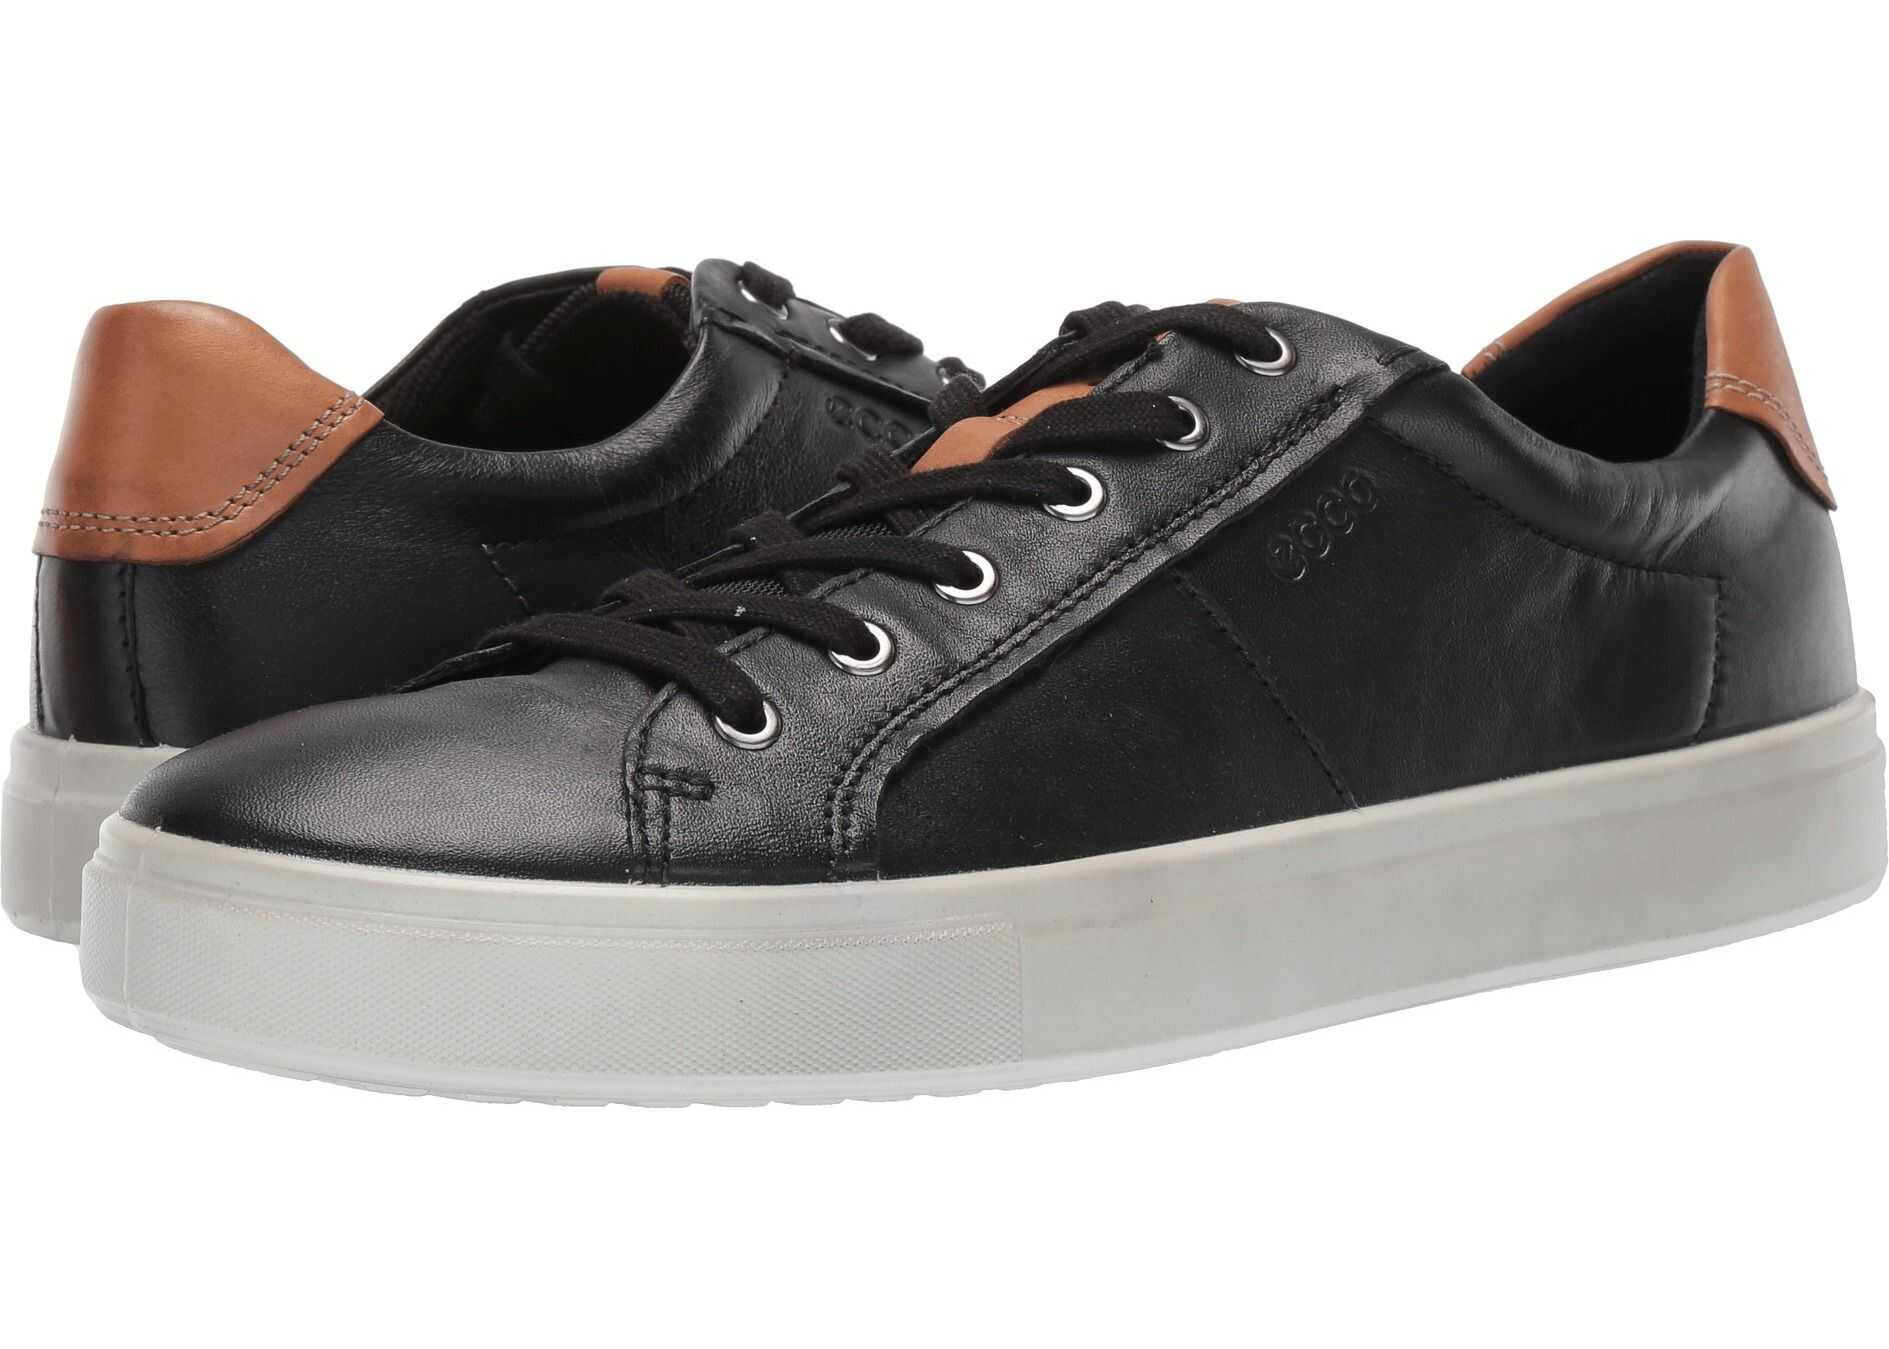 ECCO Kyle Classic Sneaker Black/Lion Cow Leather/Cow Nubuck